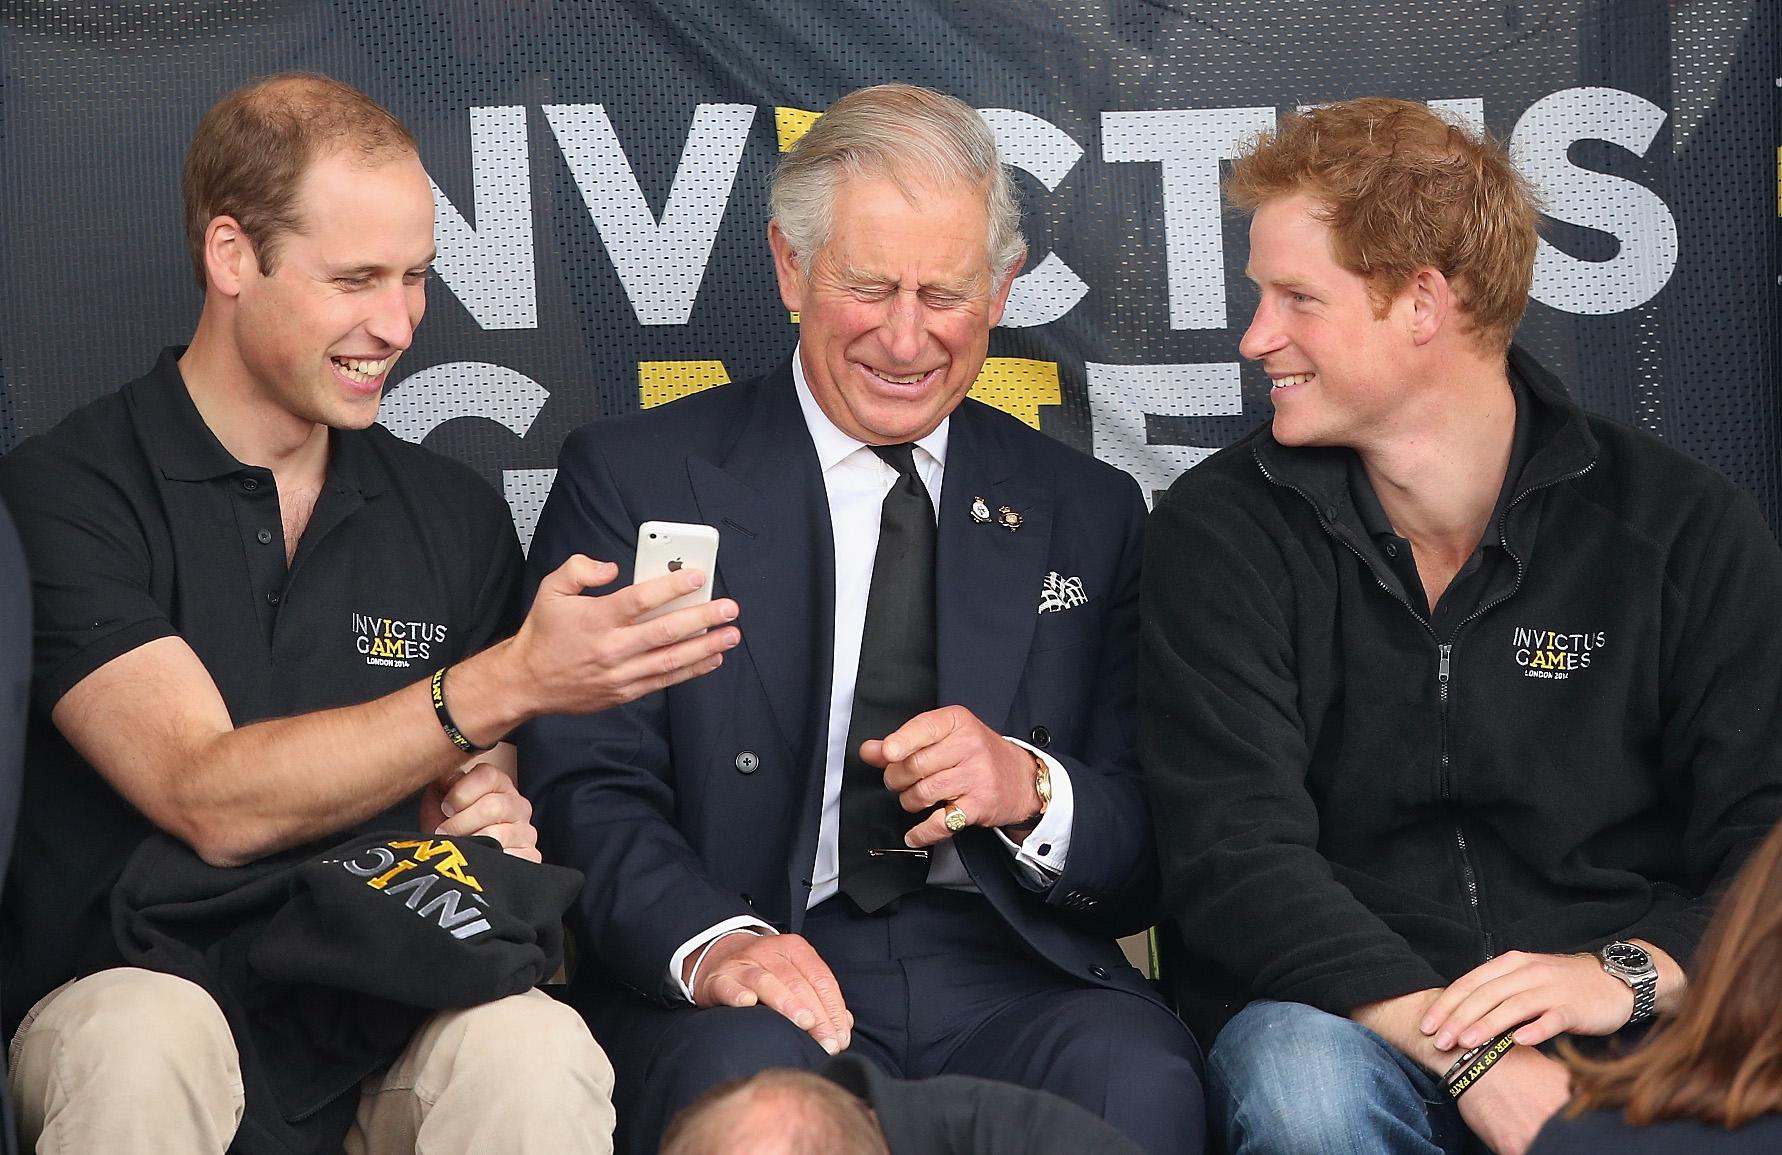 royal family on cellphones